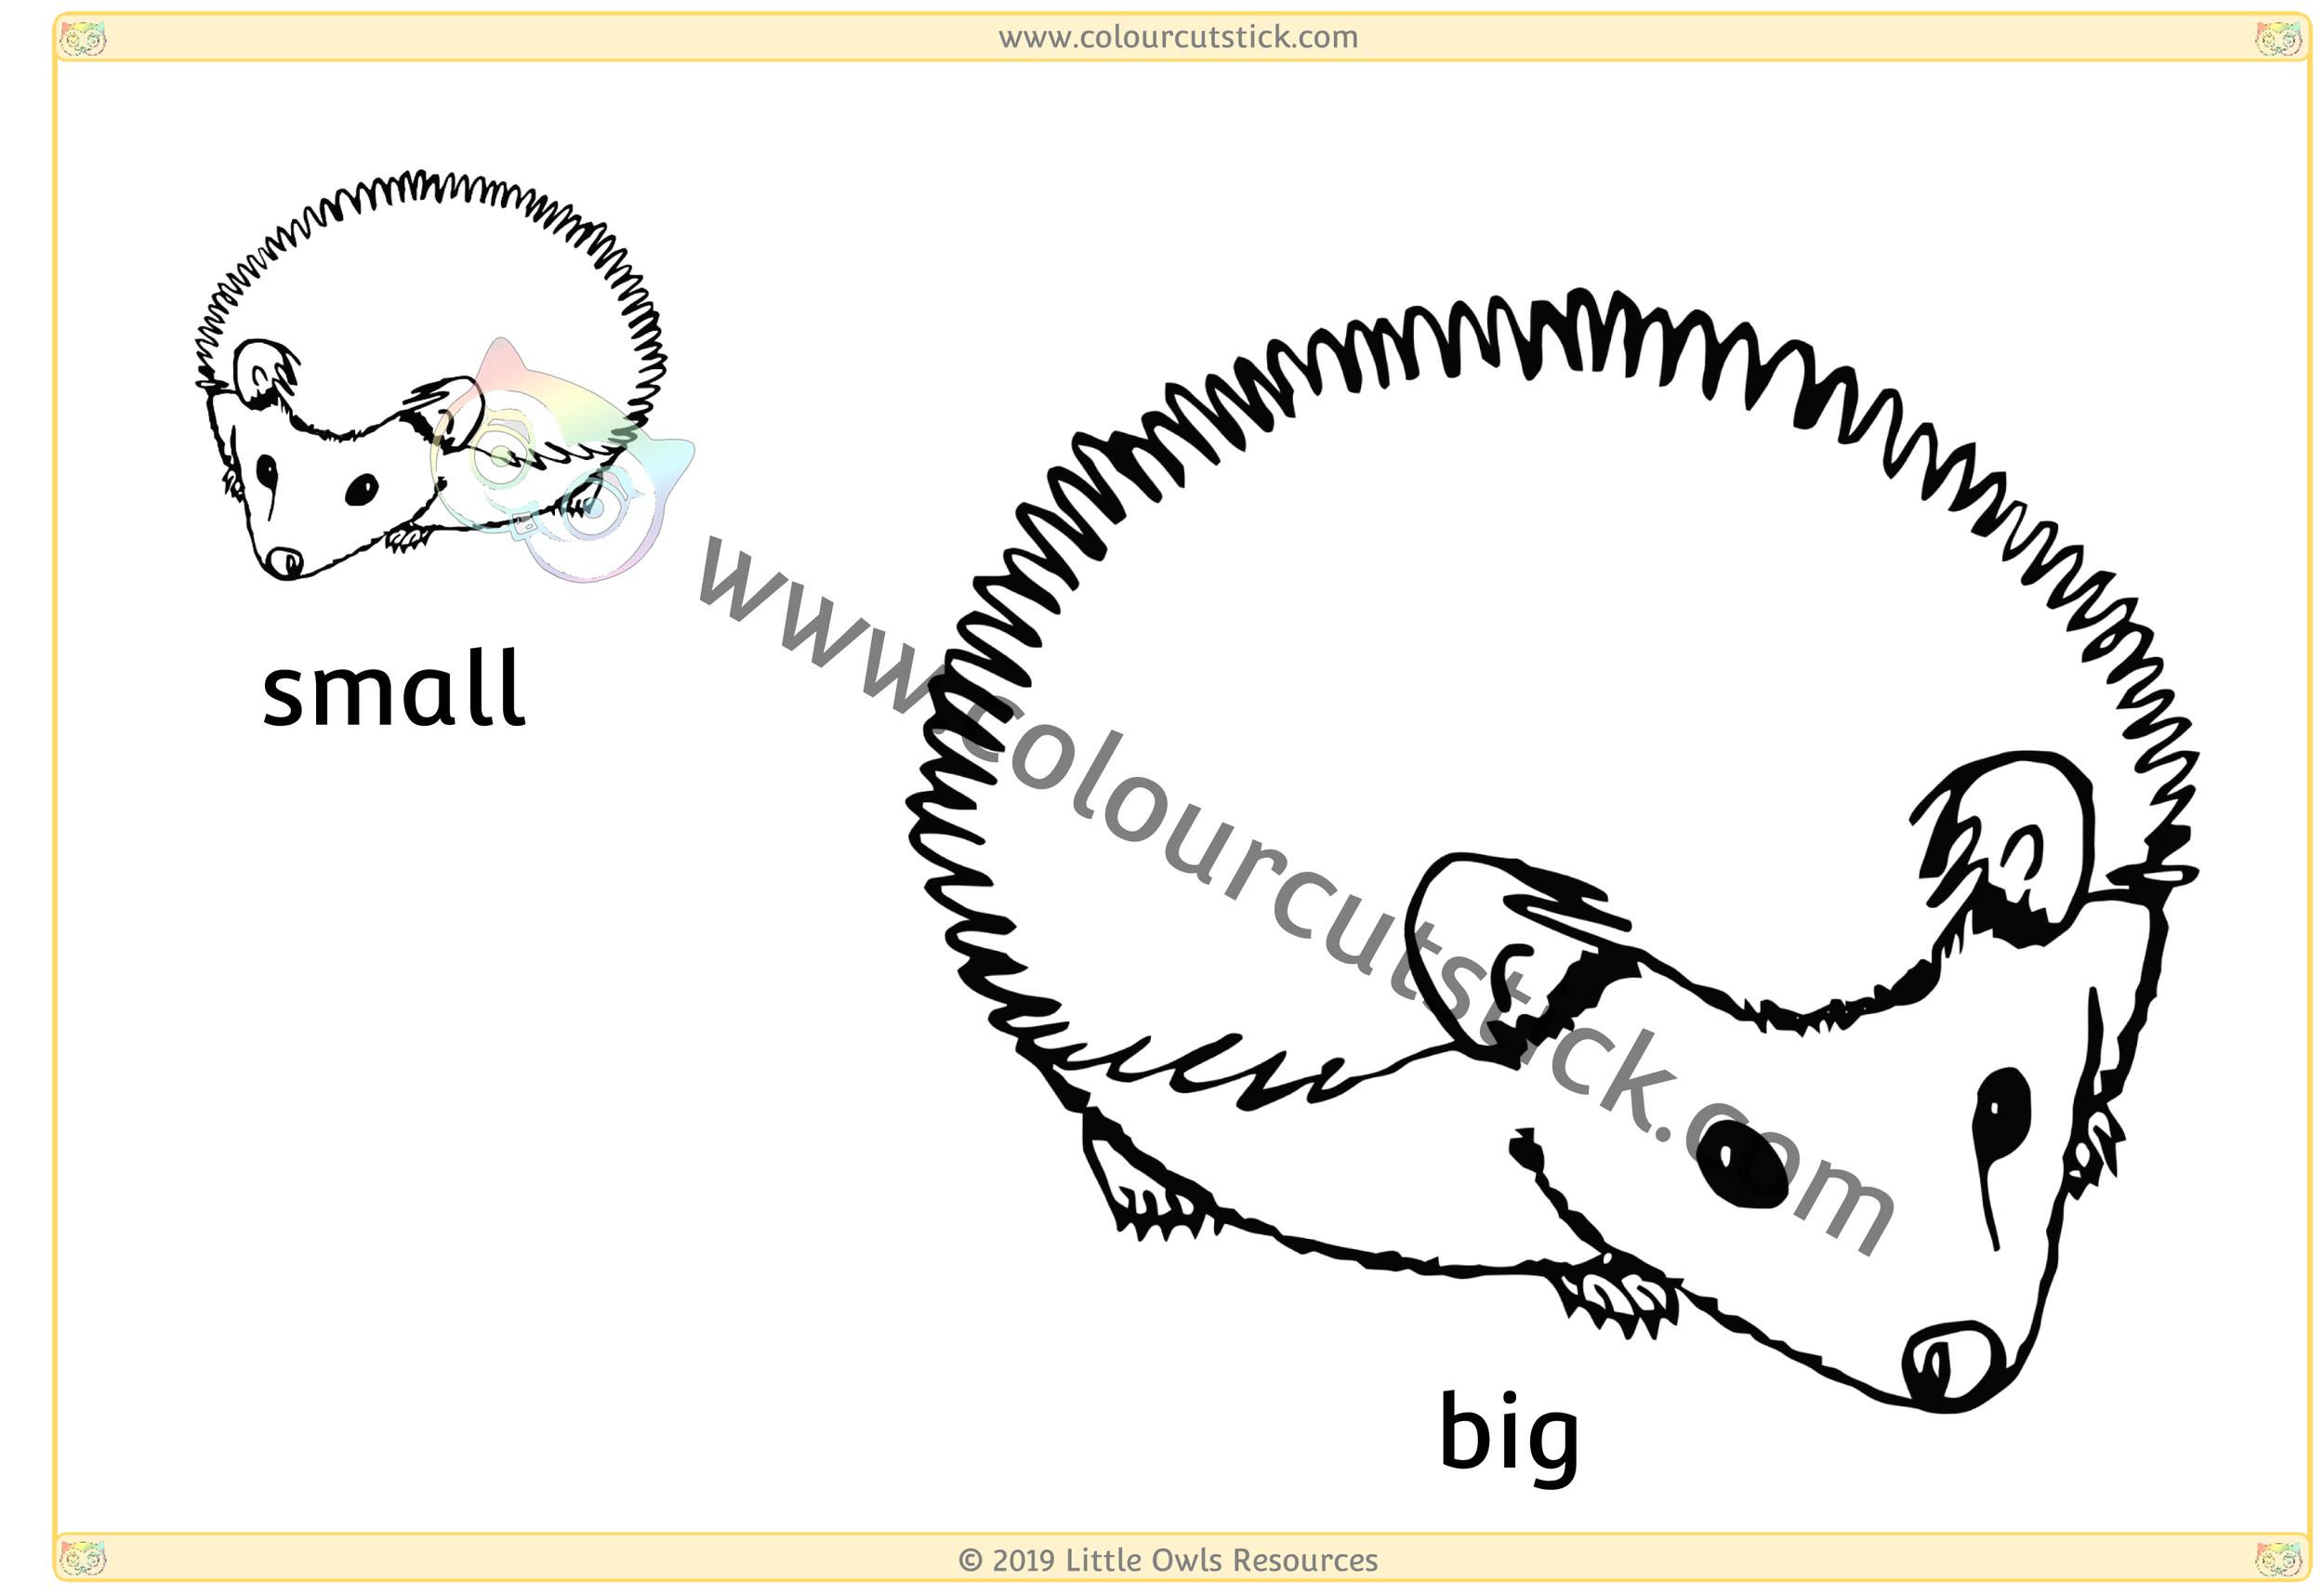 Hedgehog - Big/Small -